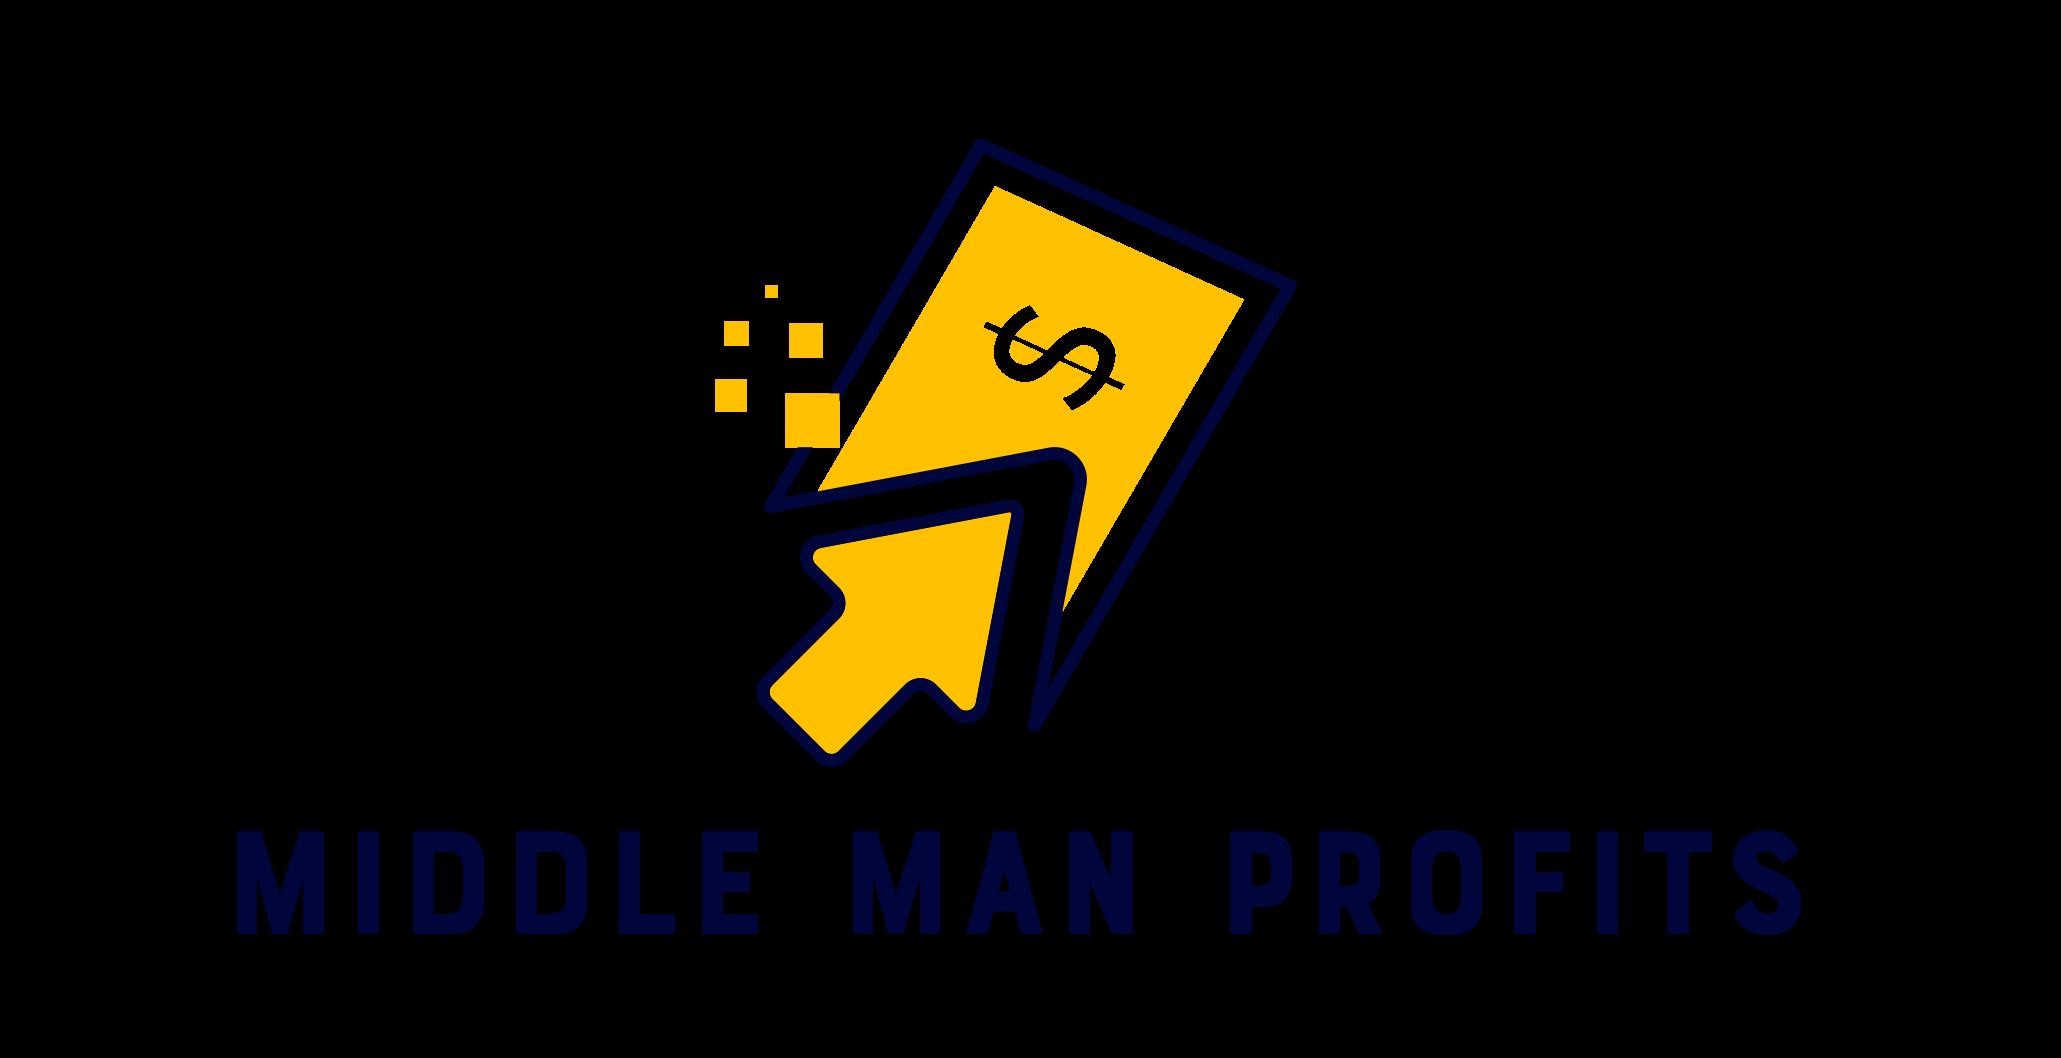 Middle Man Profits